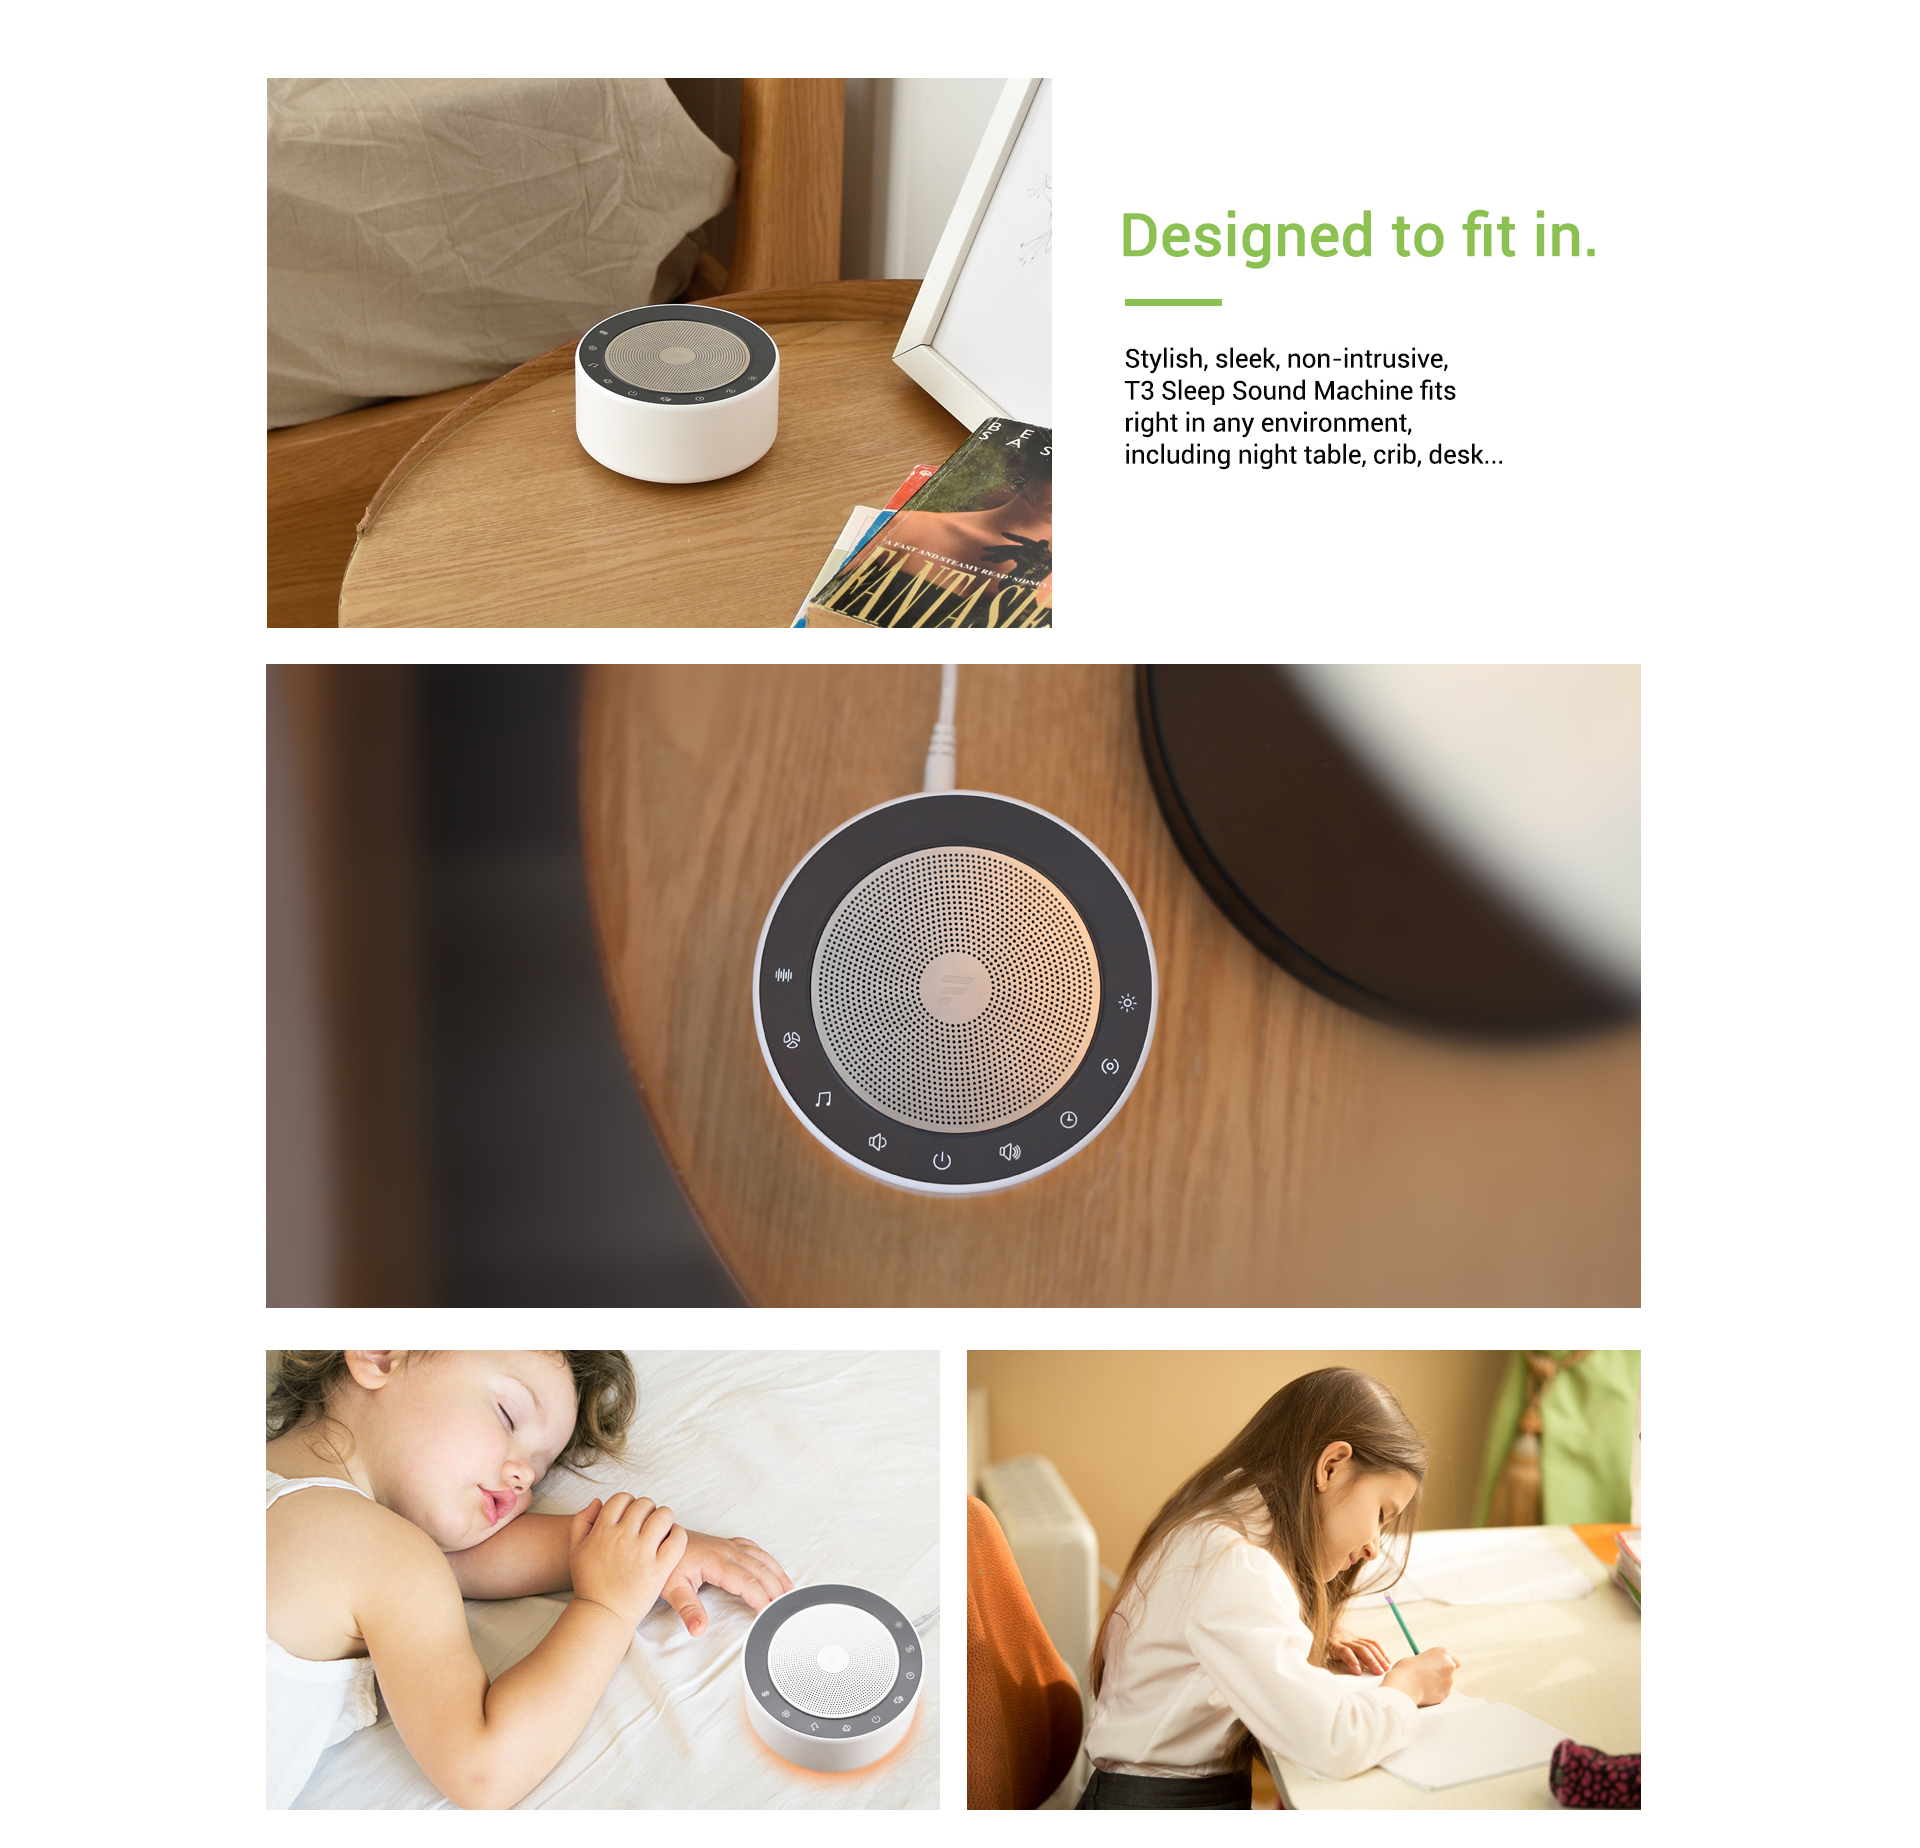 sleep sound machine for kids & adults